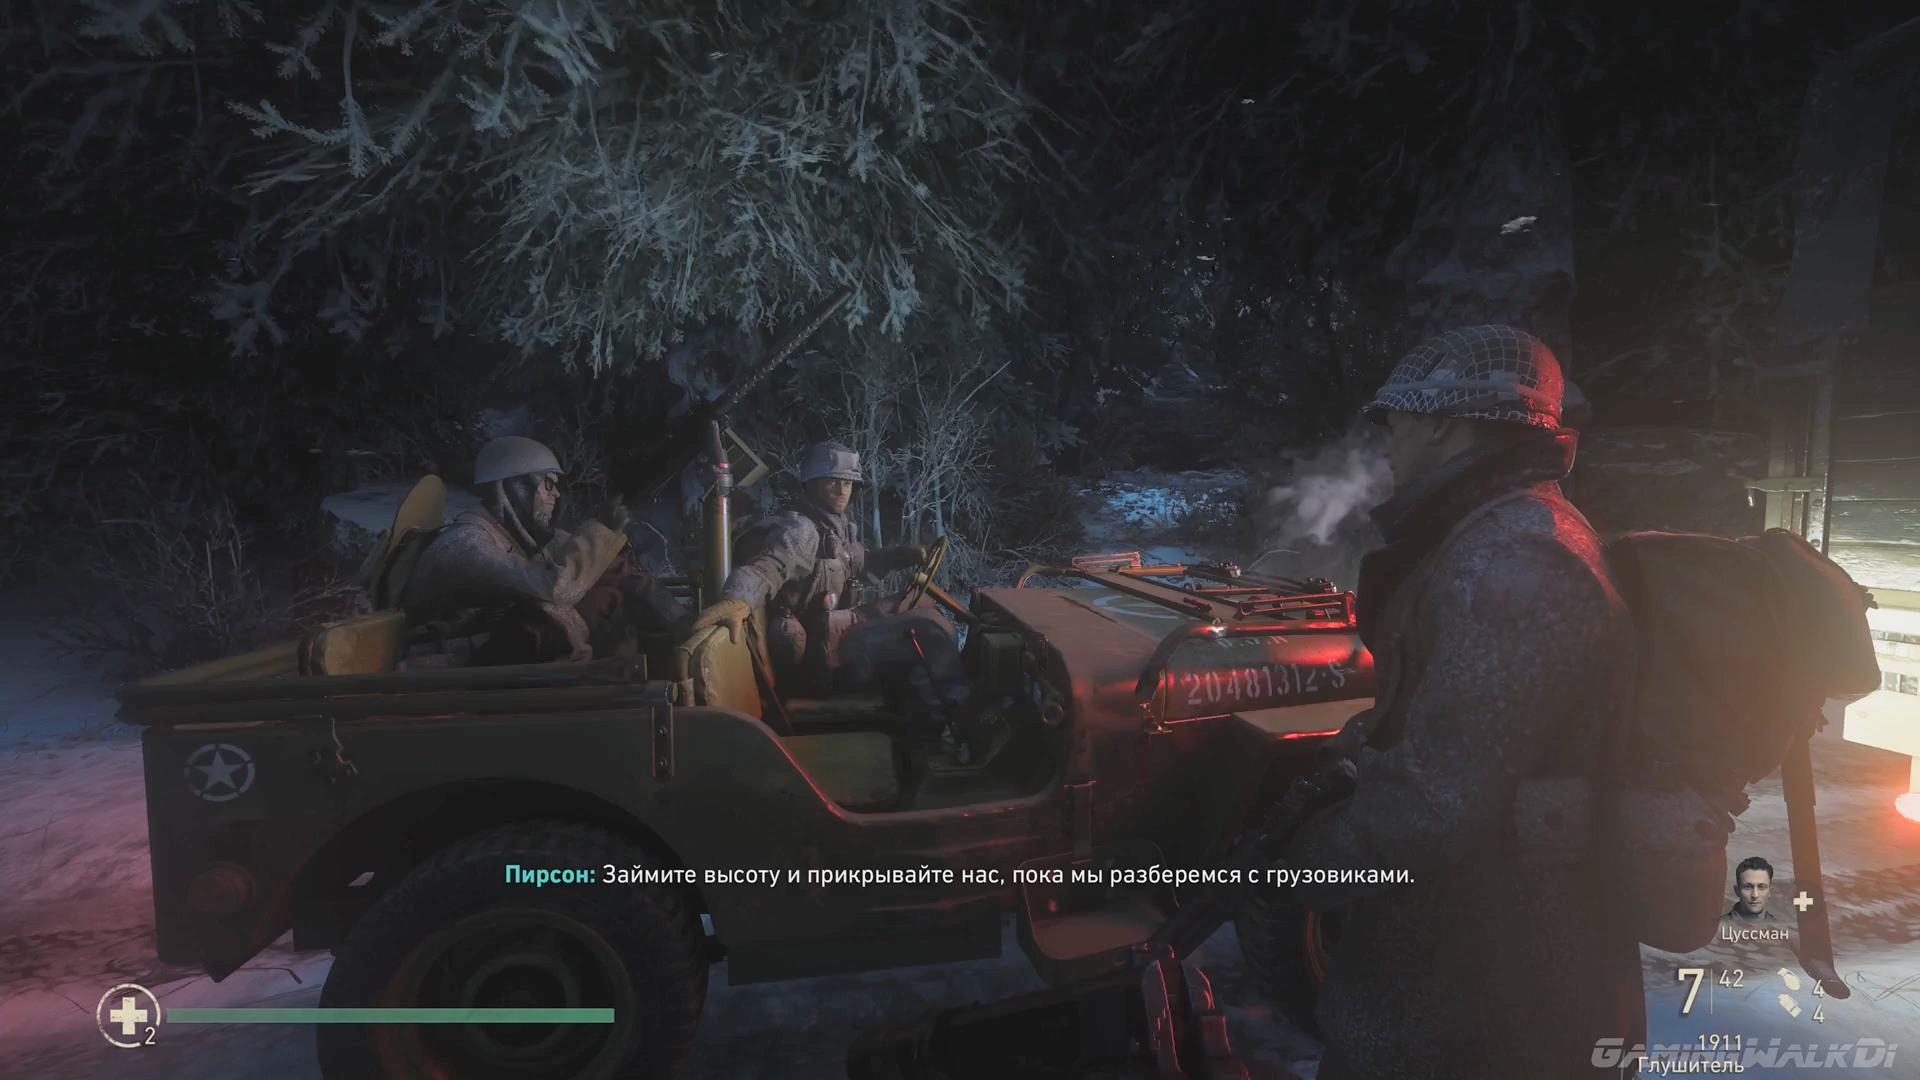 Call of Duty: WWII (2017/WEBRip) 1080p, 60 fps, D, Игрофильм